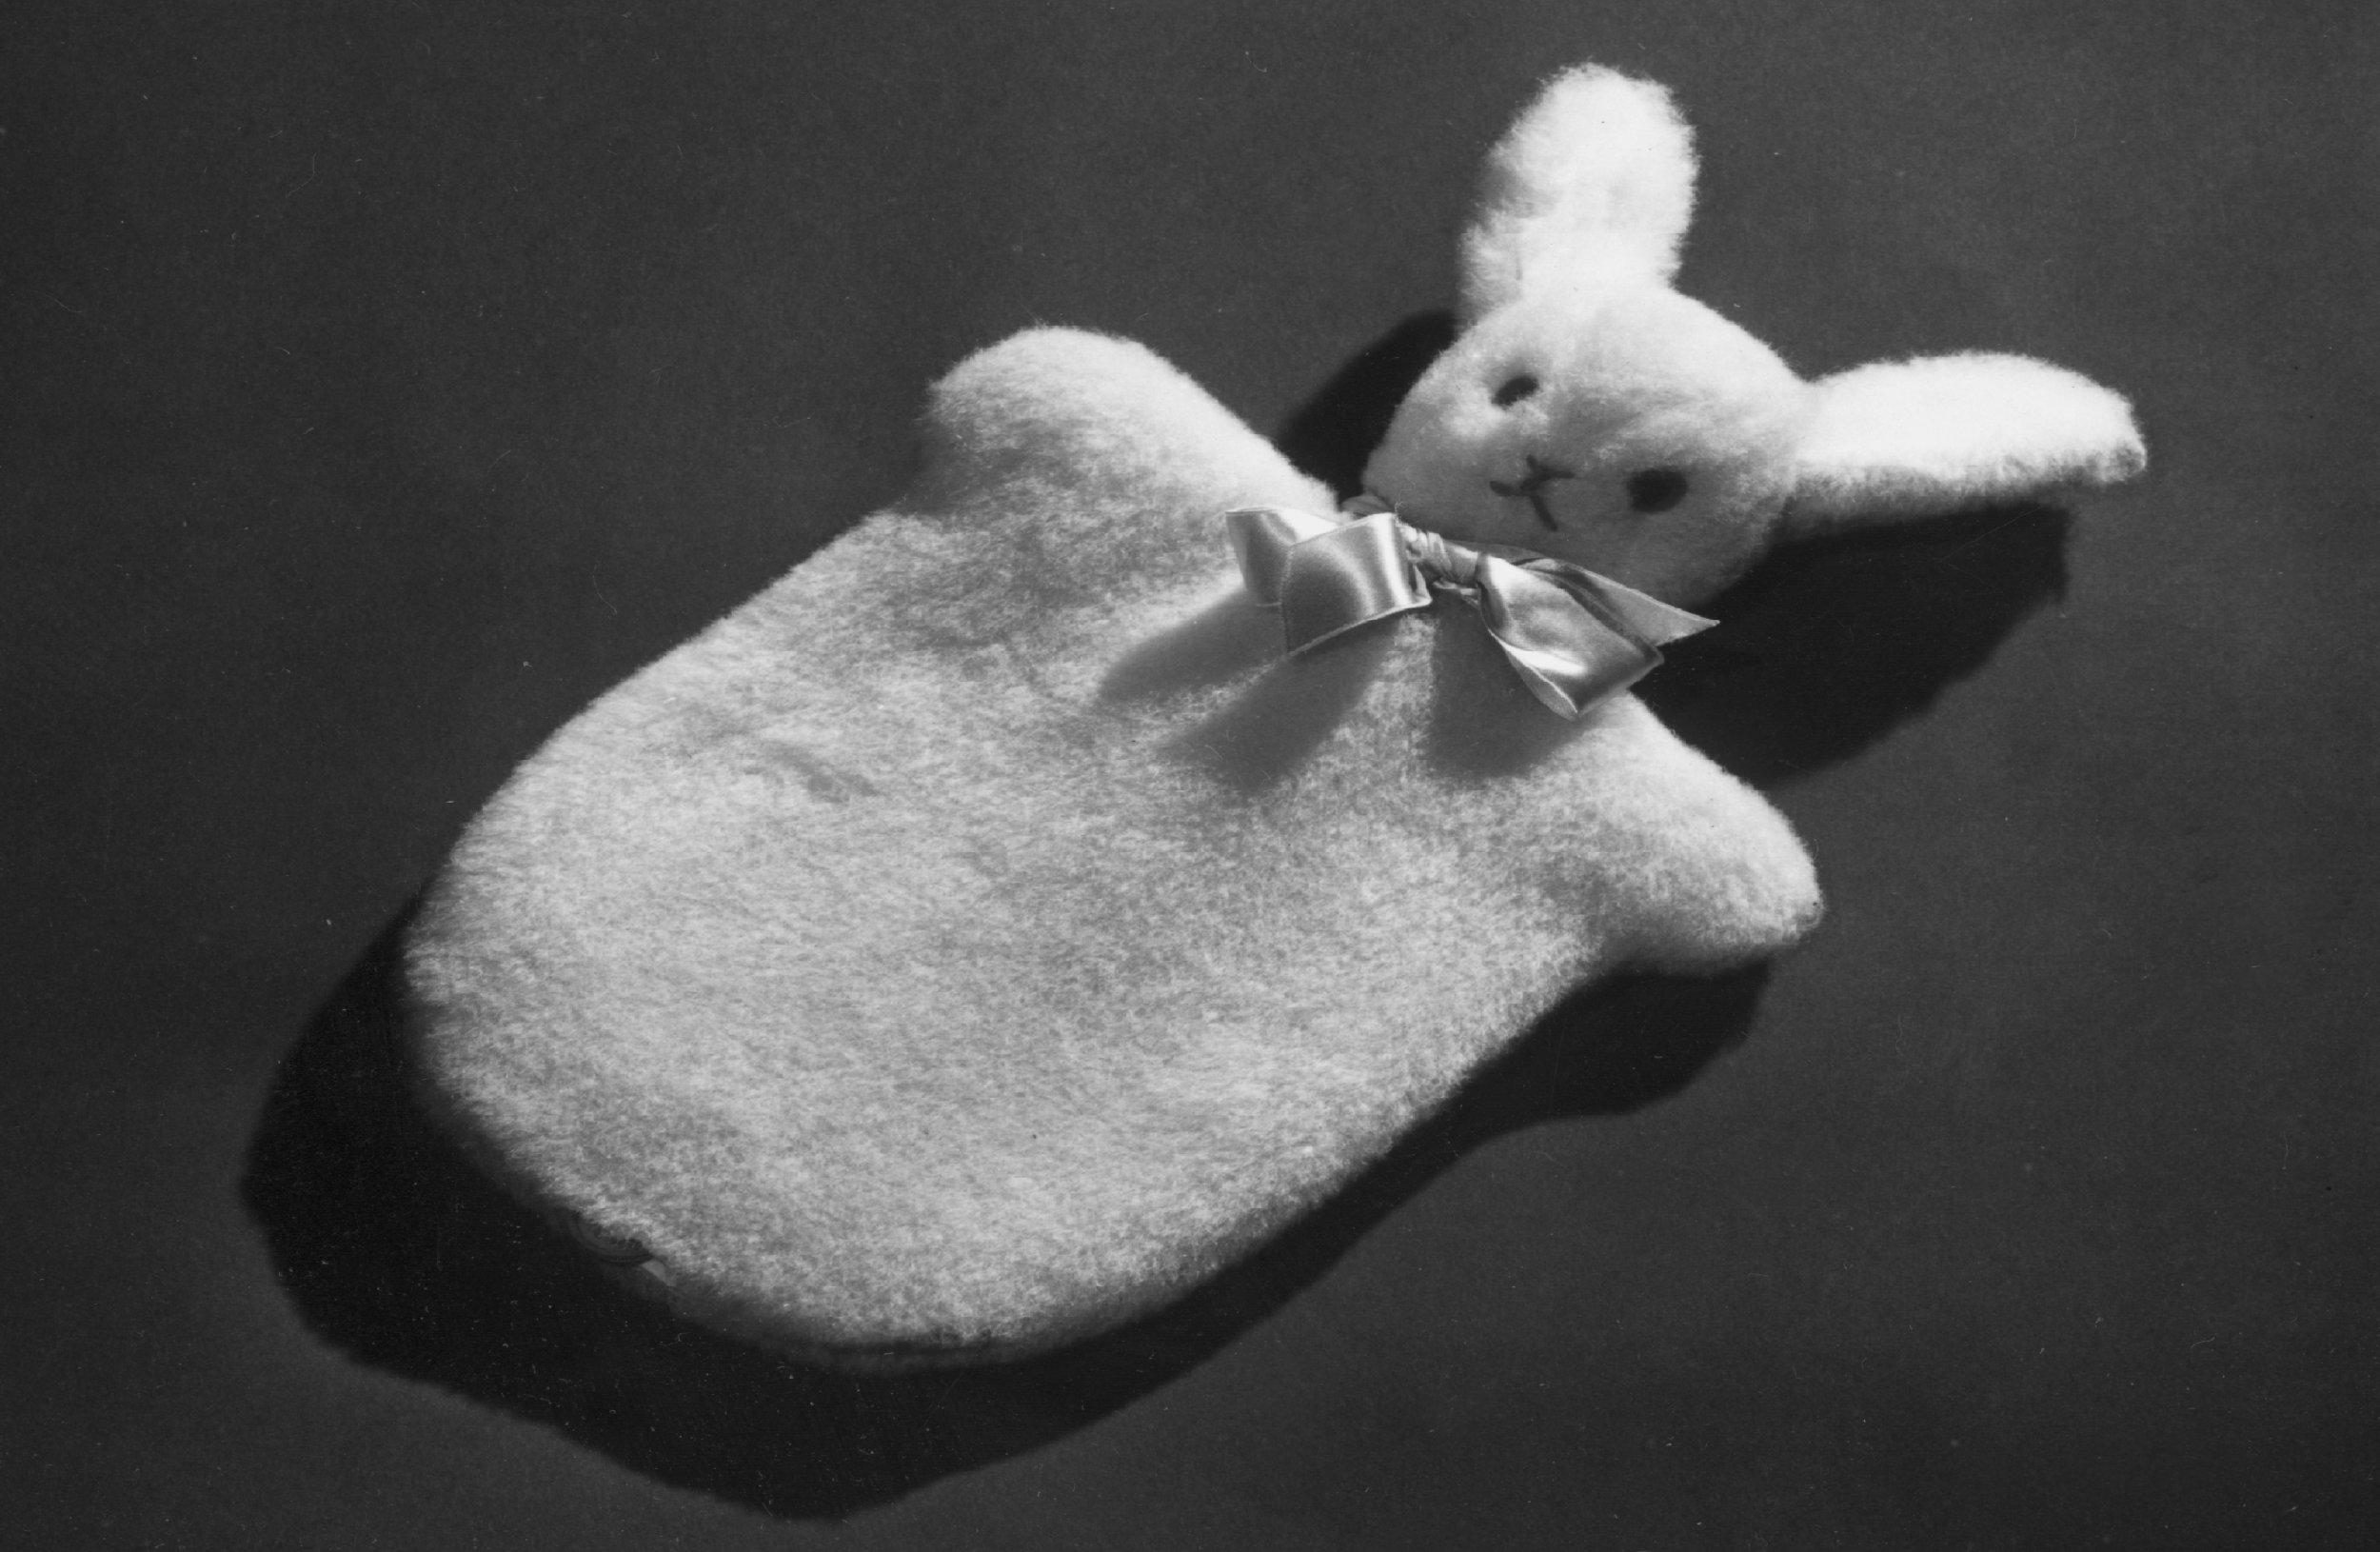 bad rabbit malware badrabbit ransomware